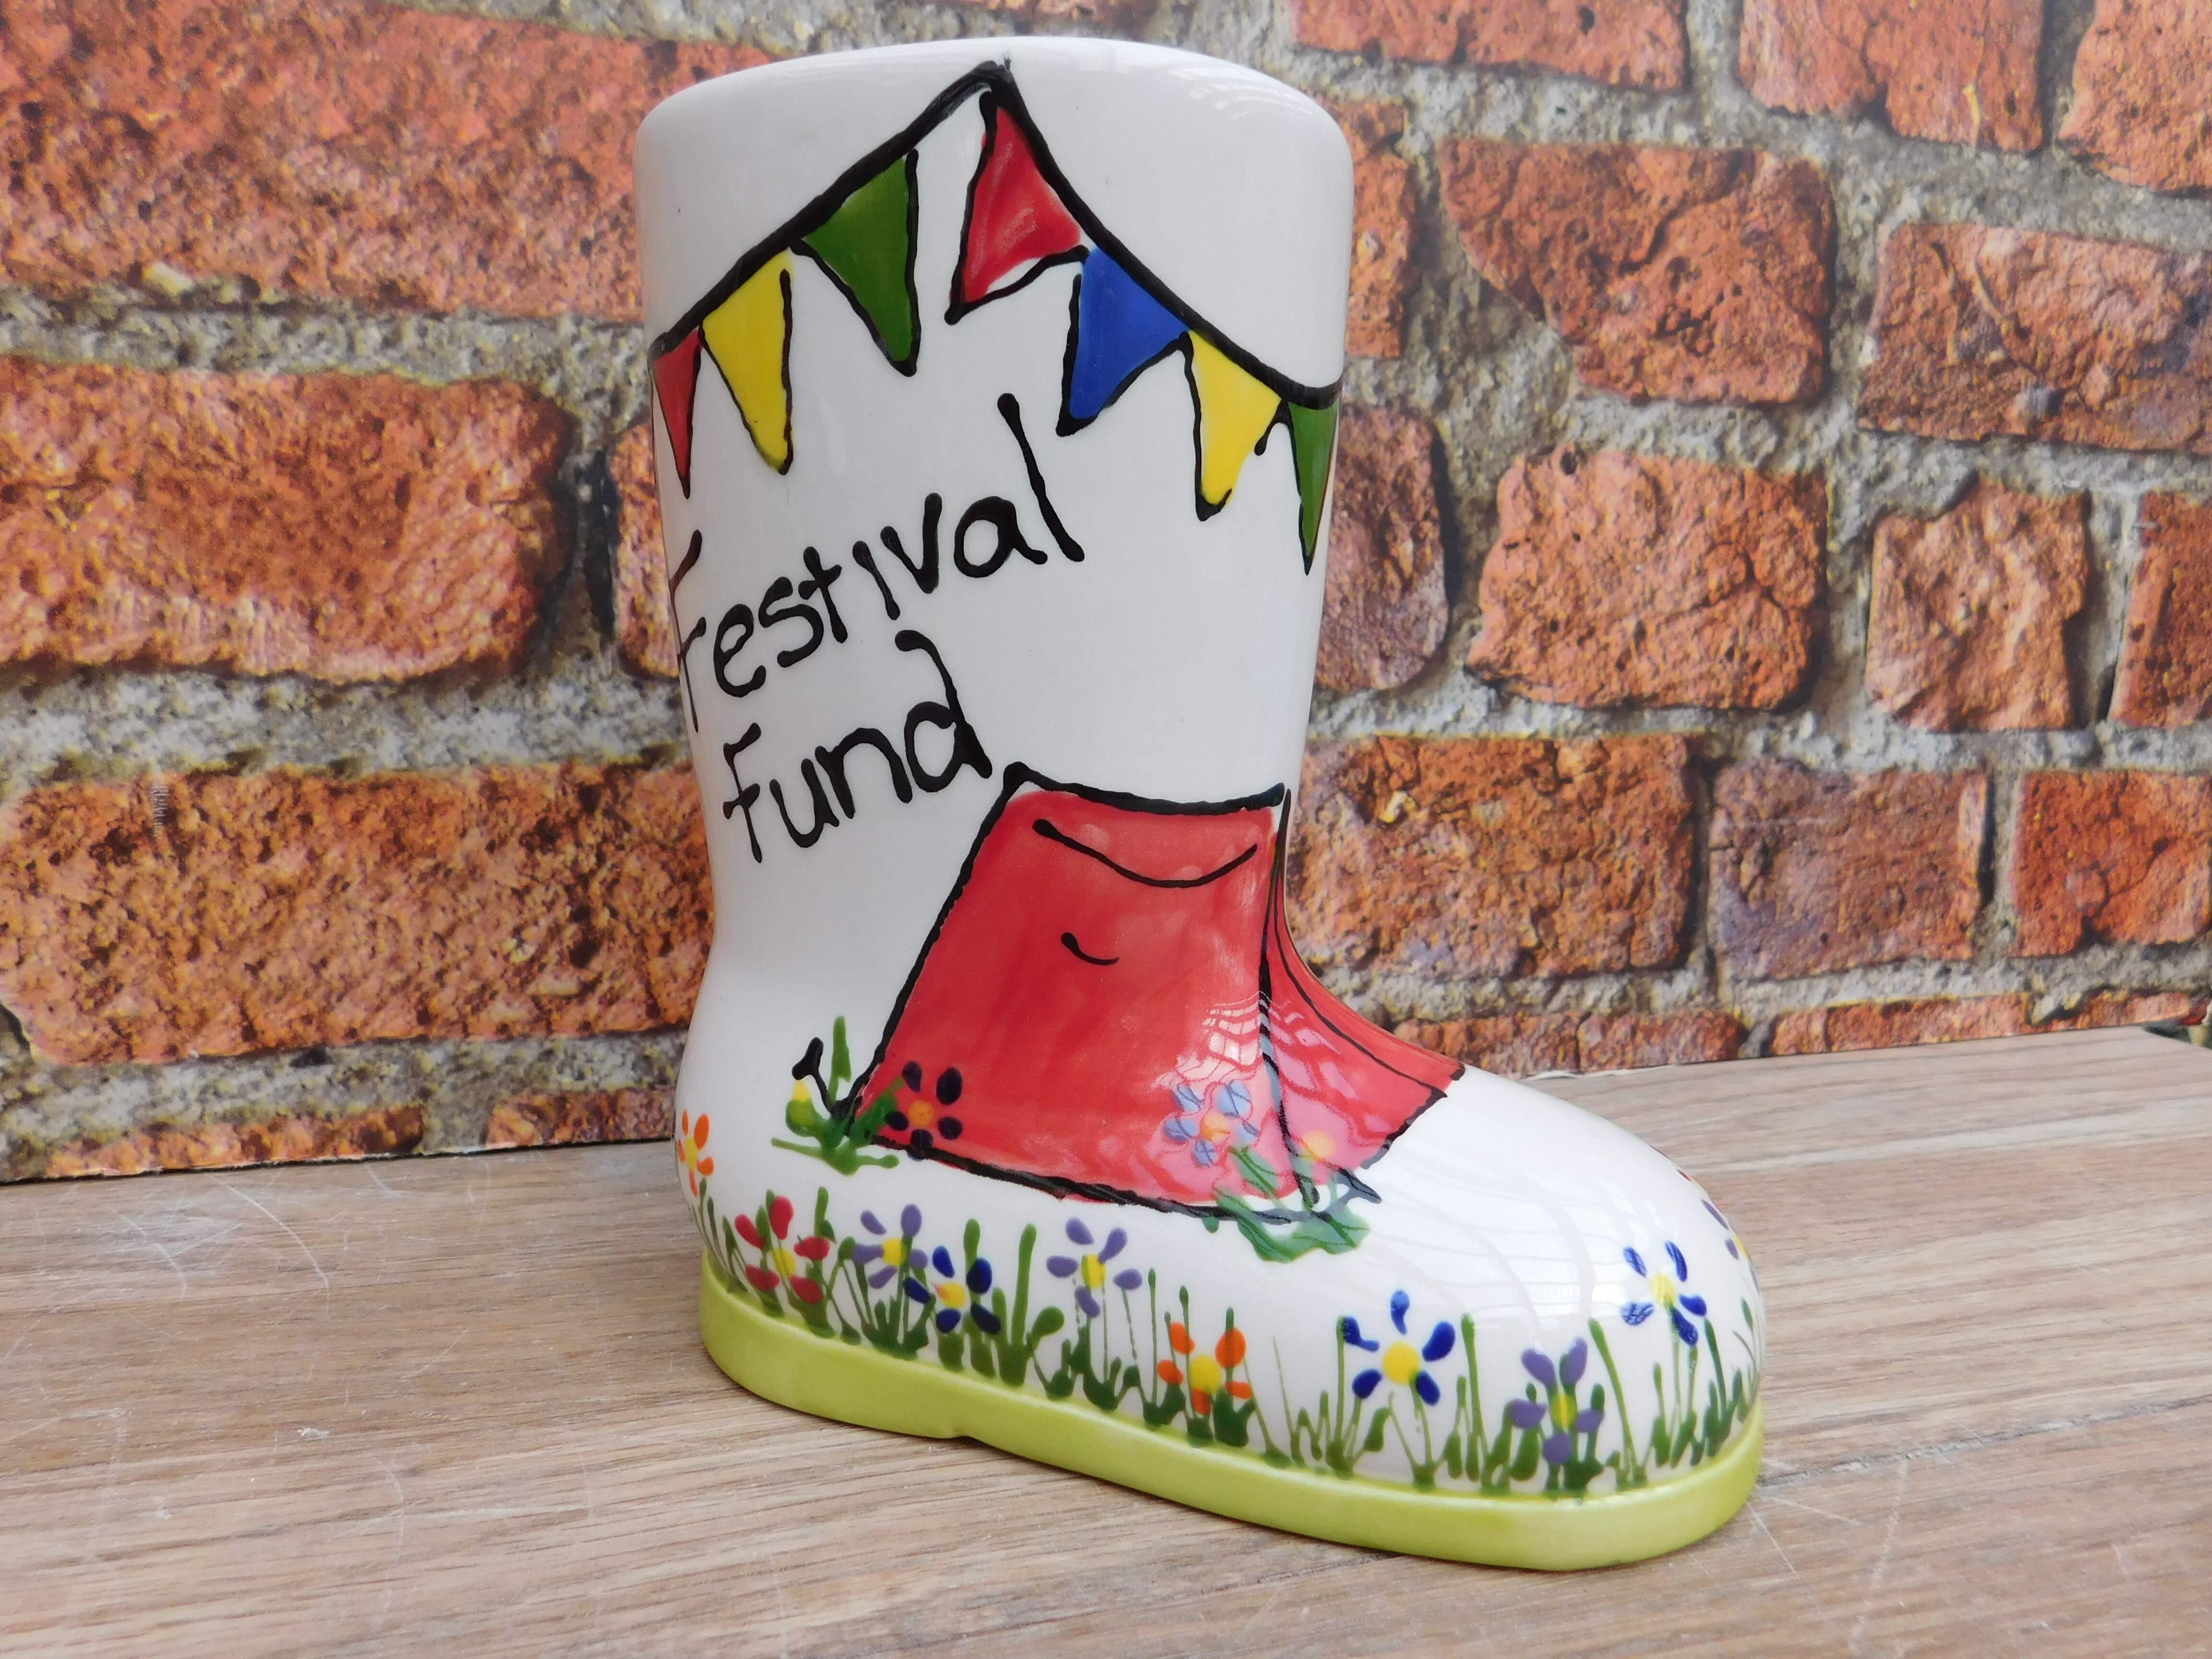 Festival Fund